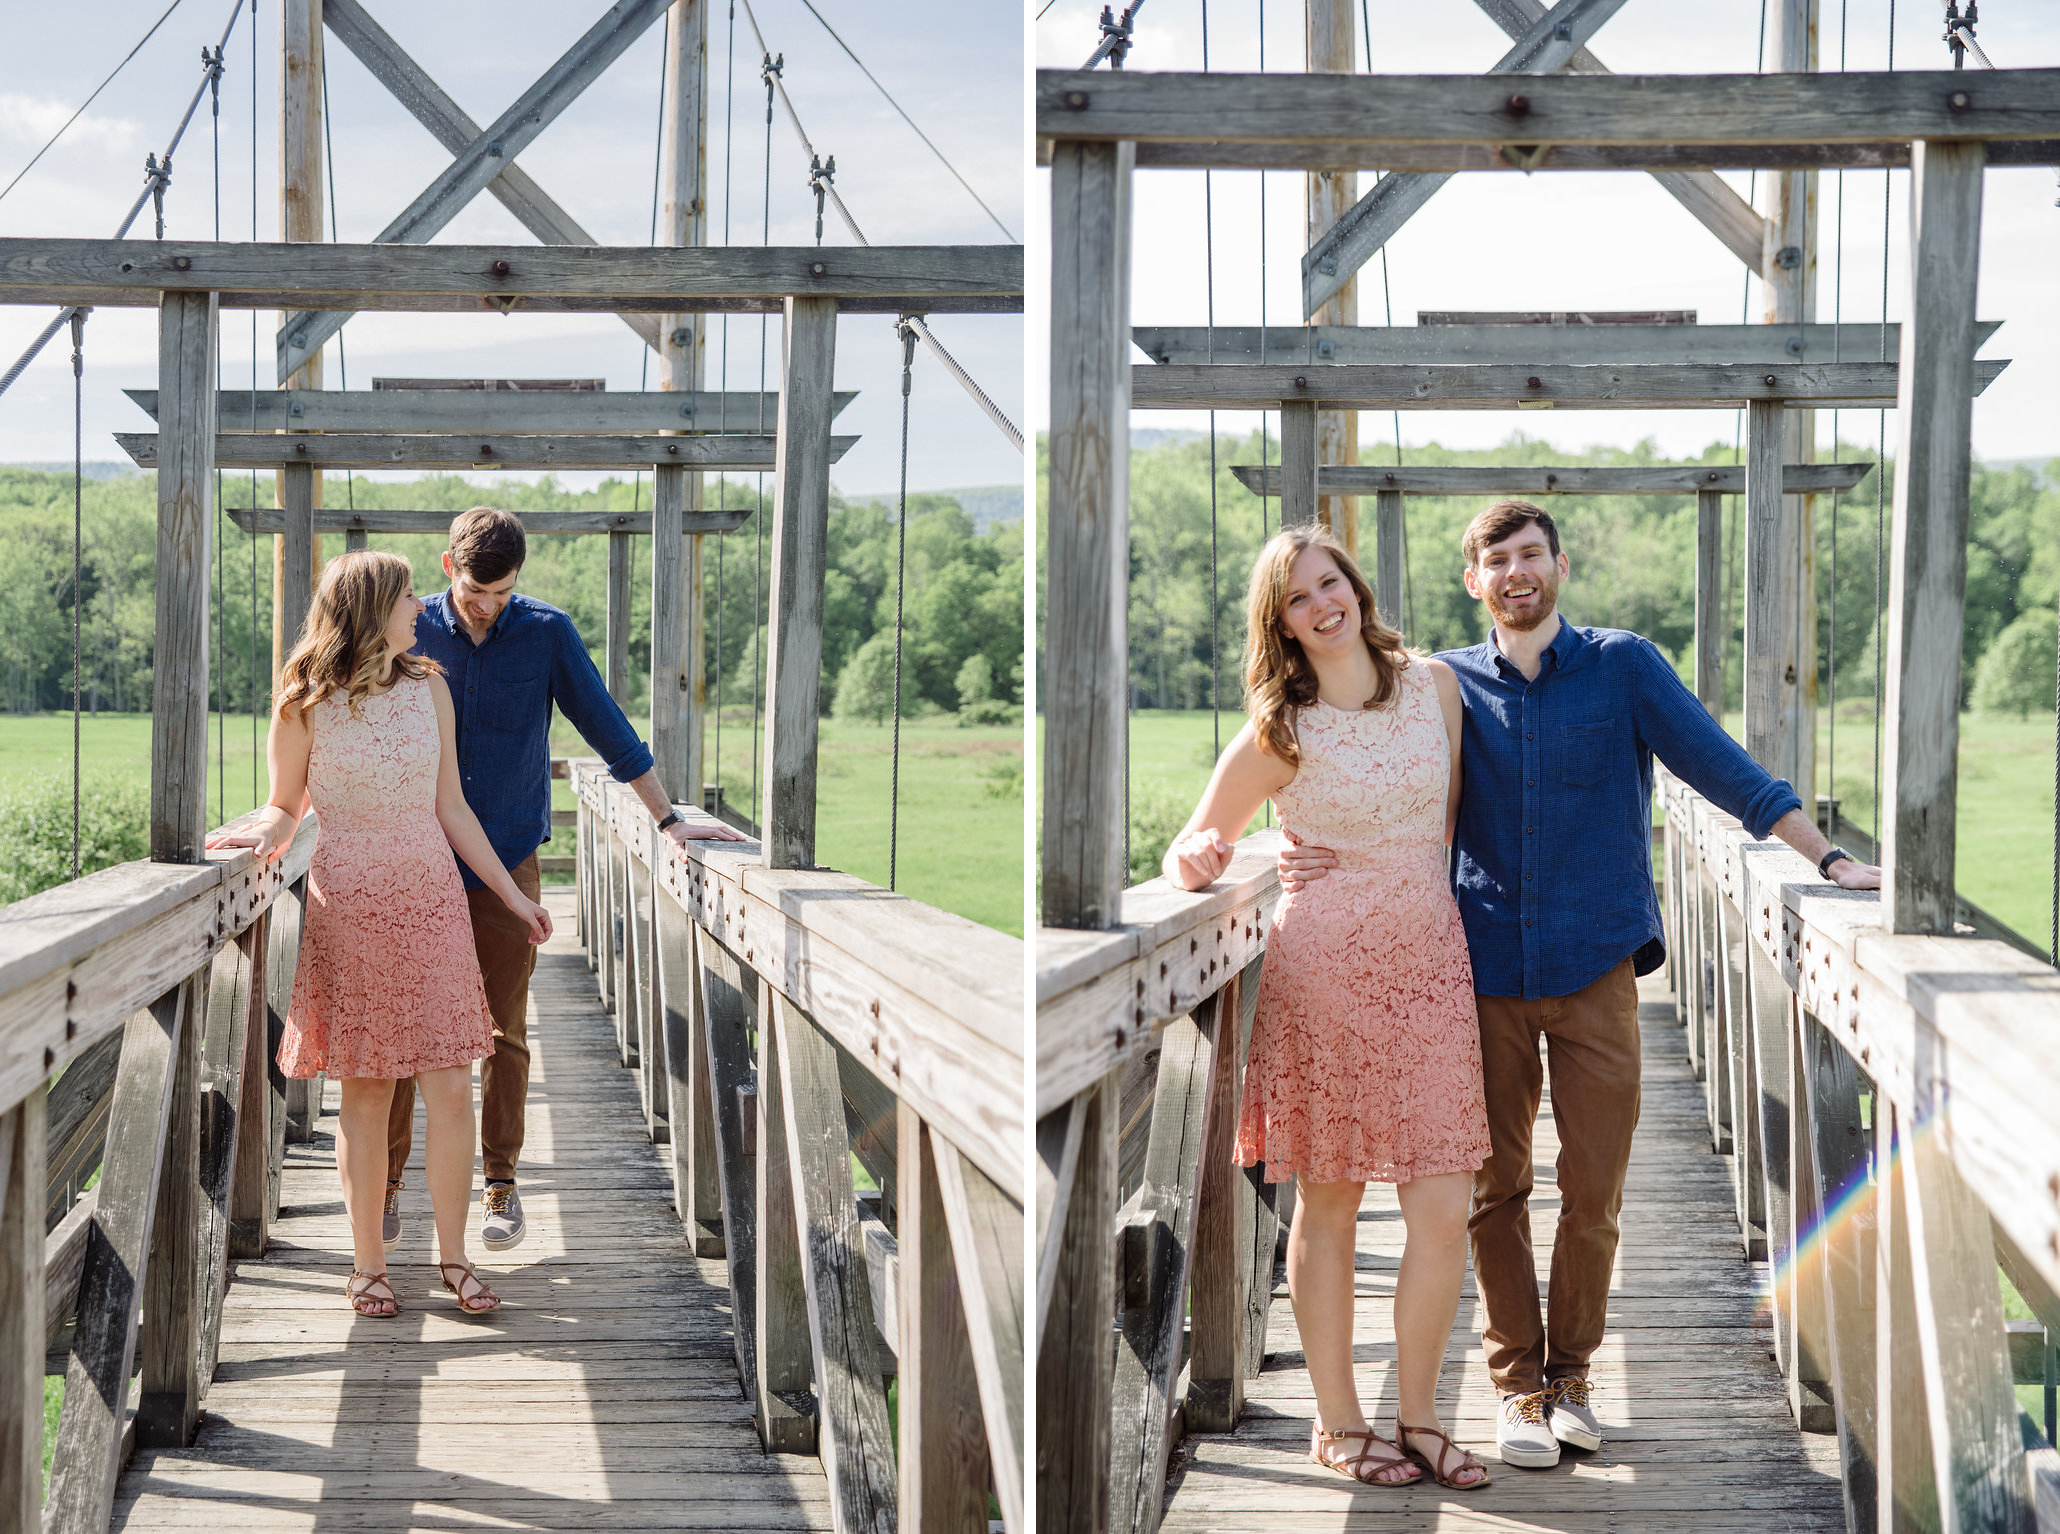 Chelsea+James-Appalachian Trail Engagement Session- Wooden Suspension Bridge- New Jersey- Olivia Christina Photo.jpg